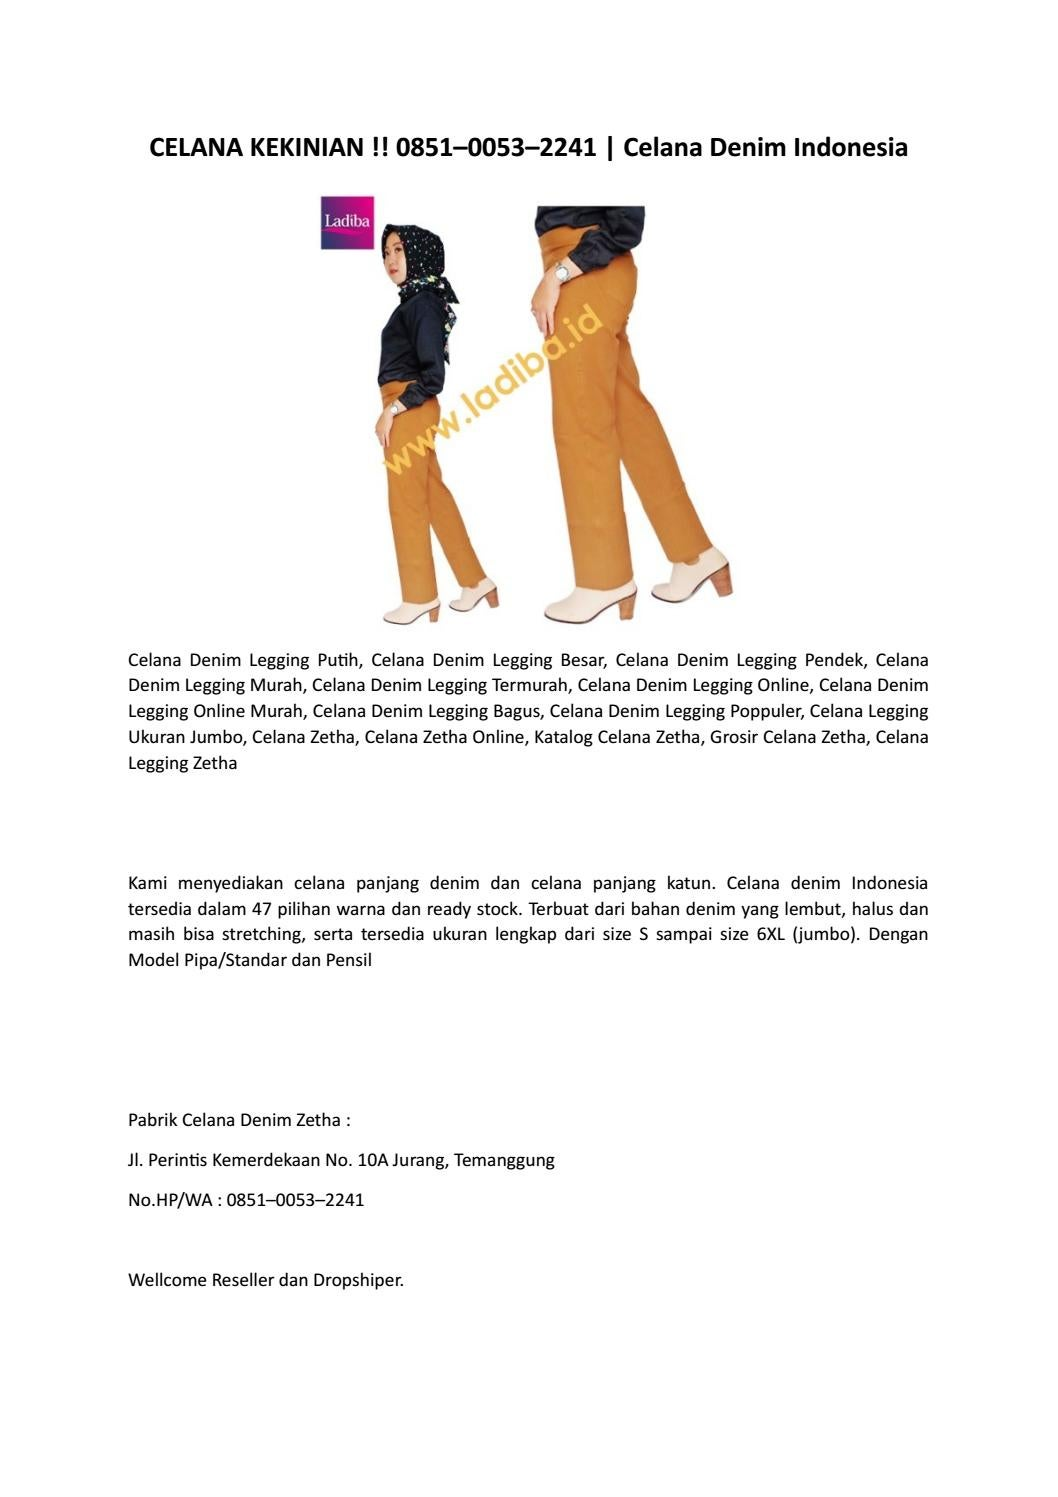 Celana Kekinian 0851 0053 2241 Celana Denim Indonesia By Distributor Celana Denim Wanita 0851 0053 2241 Issuu